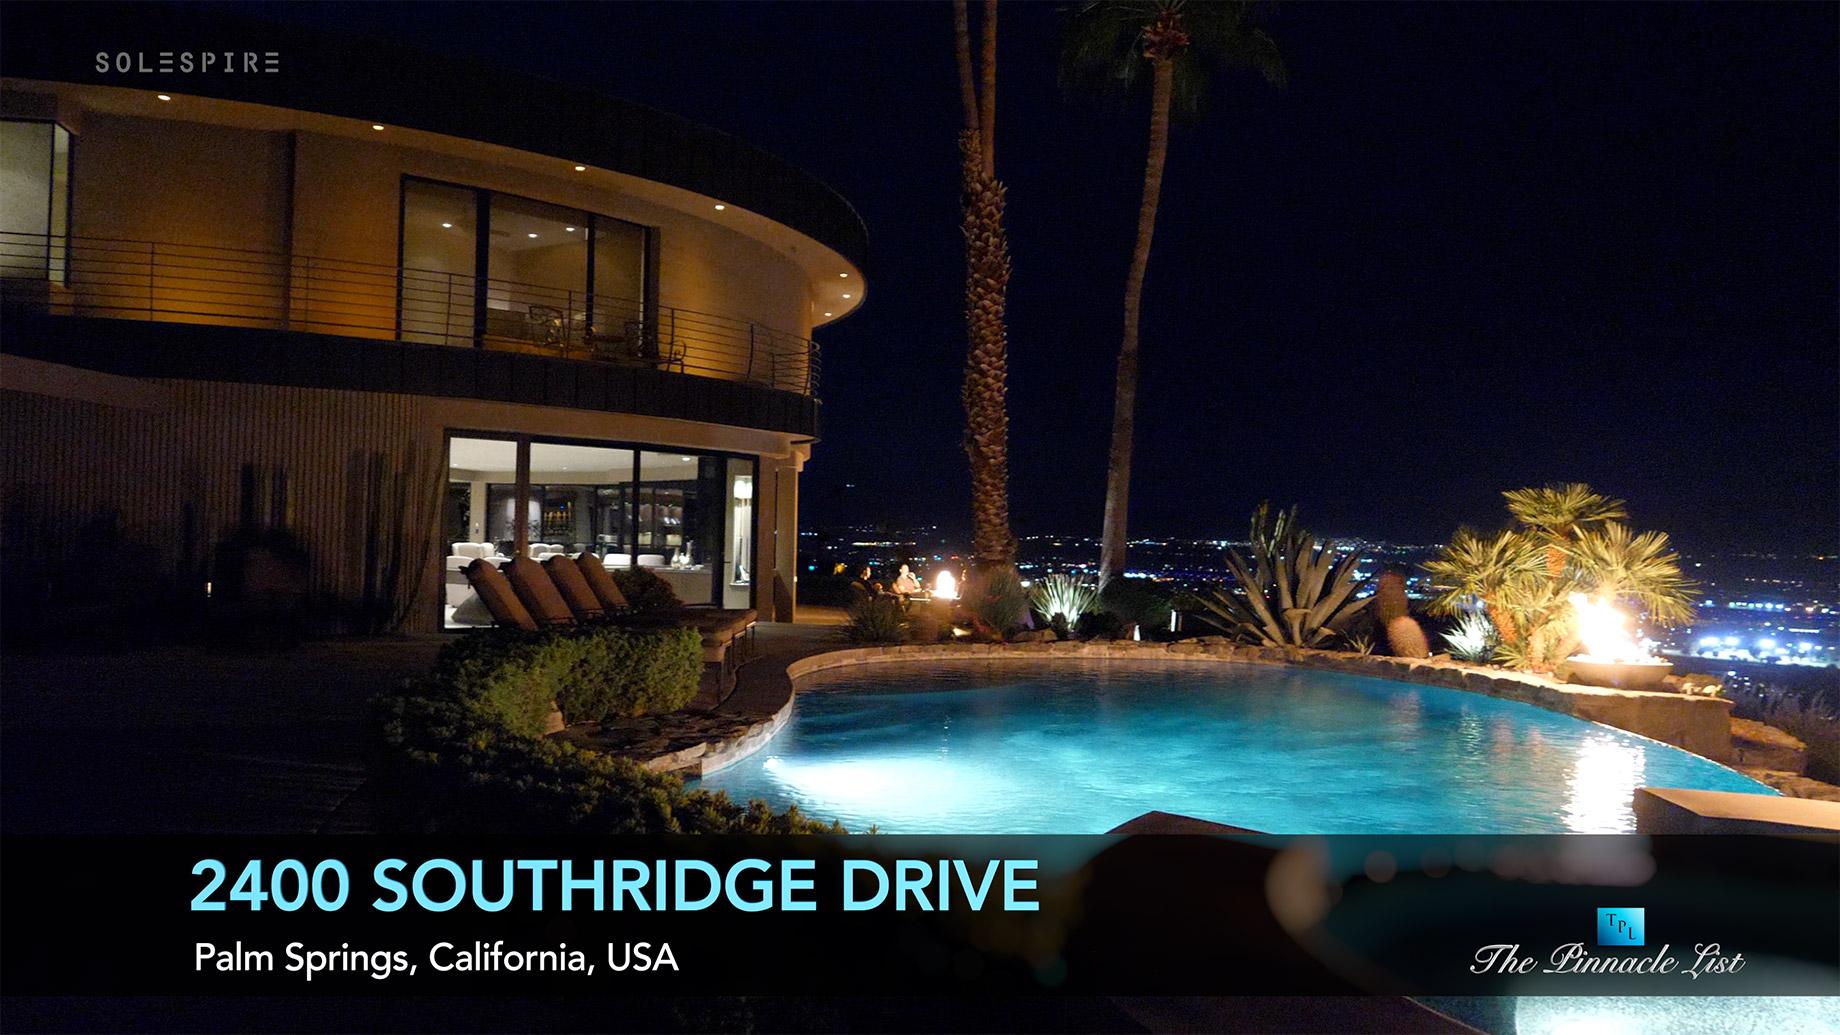 2400 Southridge Dr, Palm Springs, California - Marcus Anthony & Josh Reef - Luxury Real Estate - Video